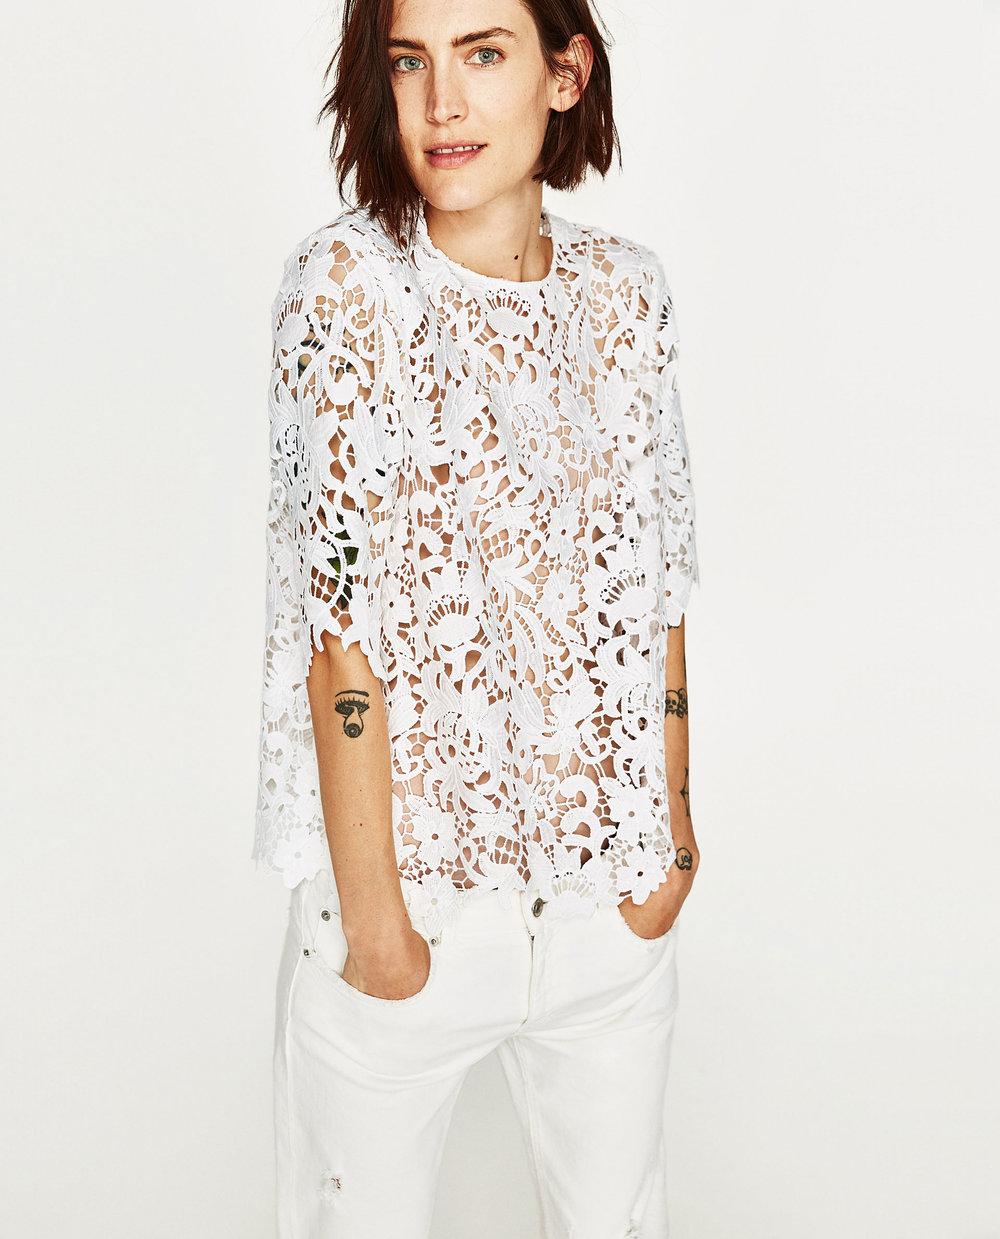 Zara: lace top, £29.99